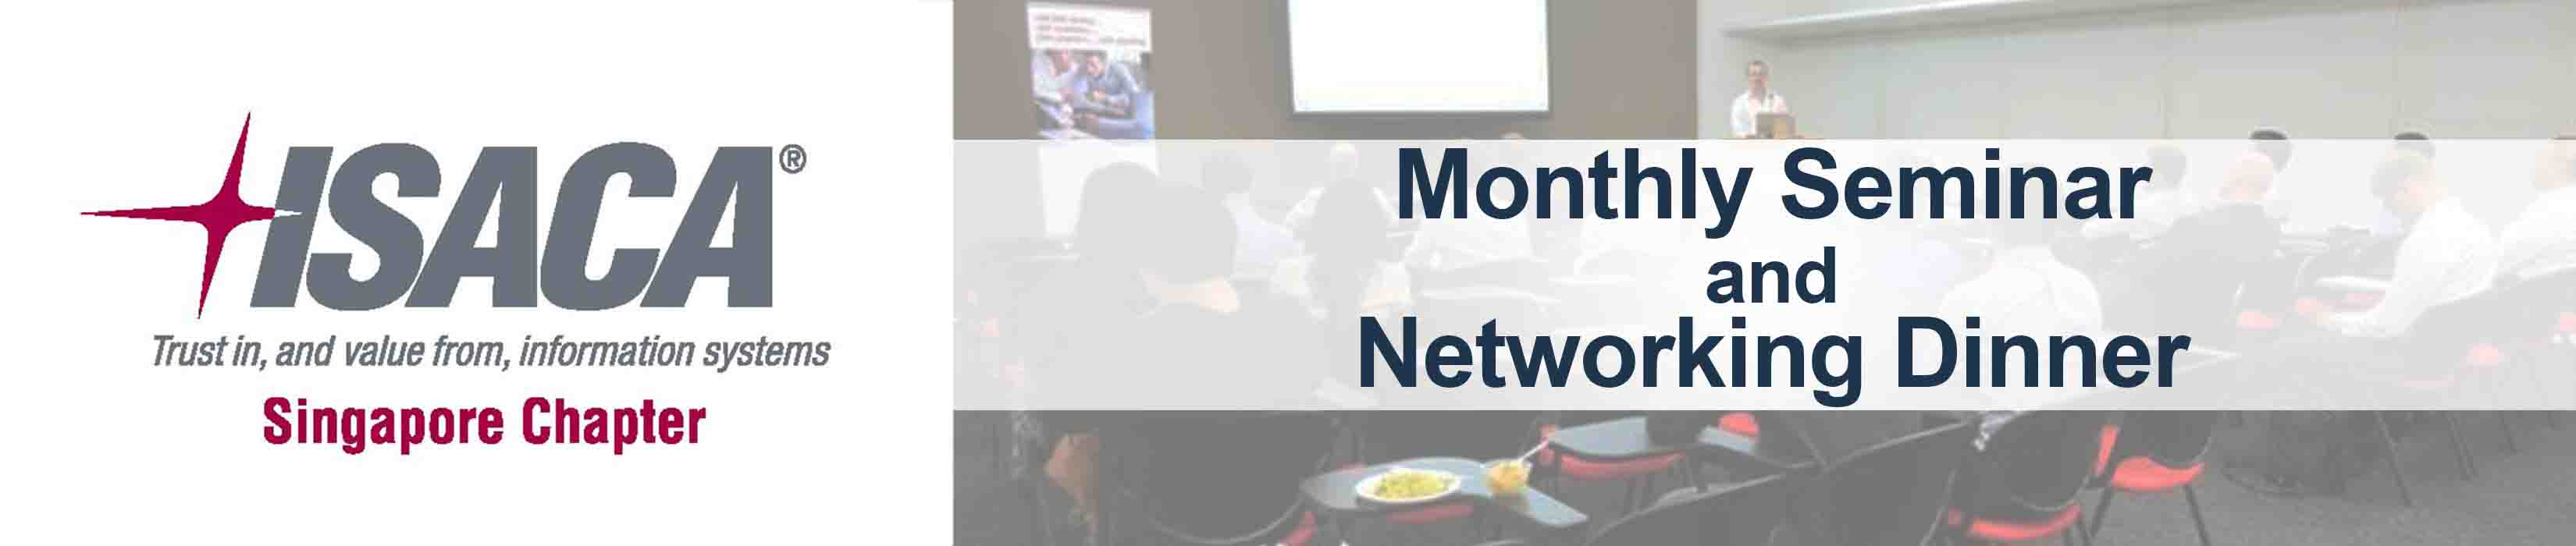 ISACA_Monthly_Seminar